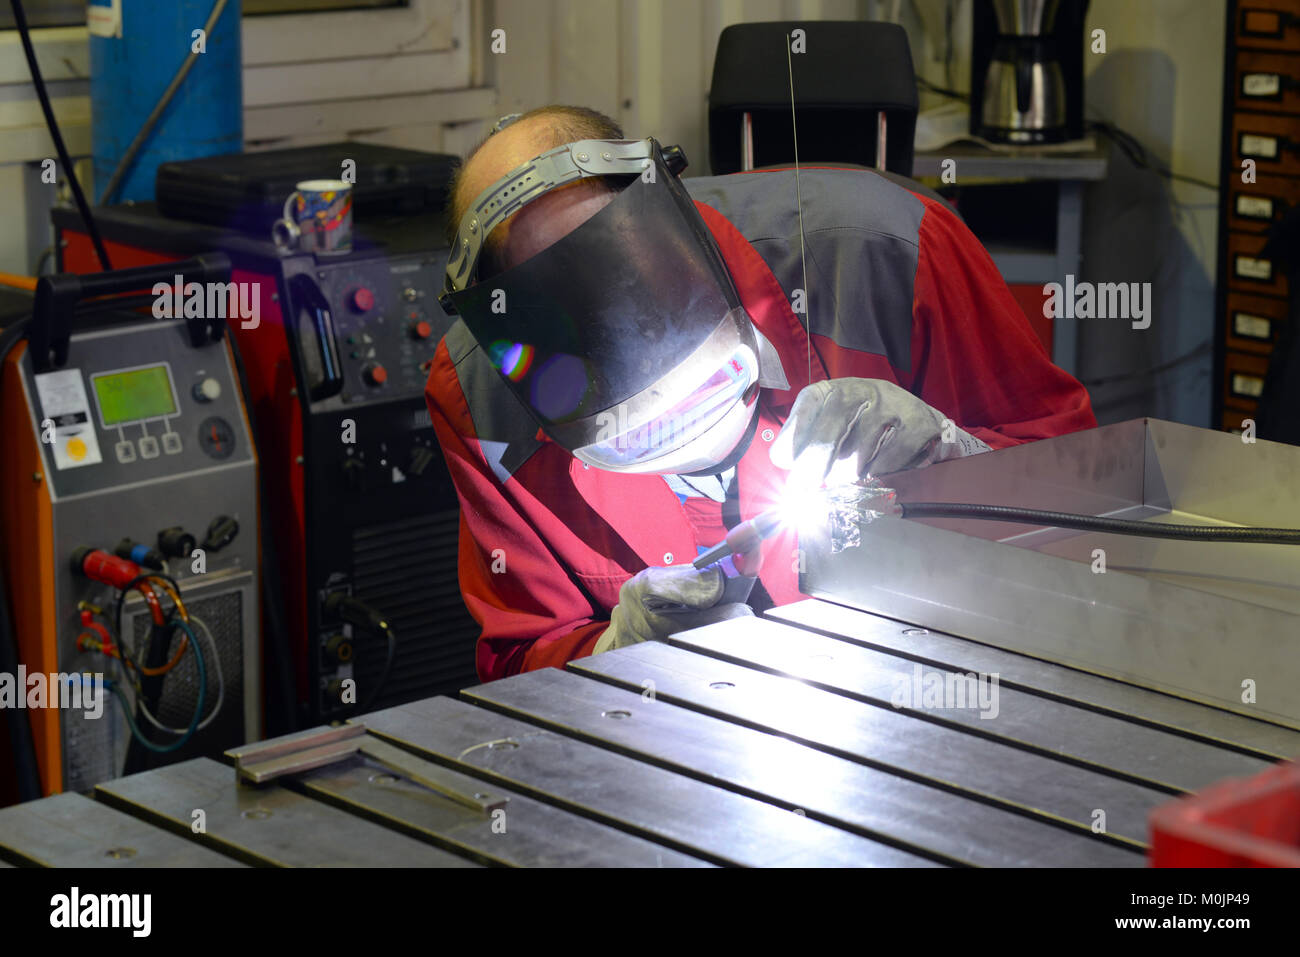 Saldatore lavora nell'industria metall Immagini Stock